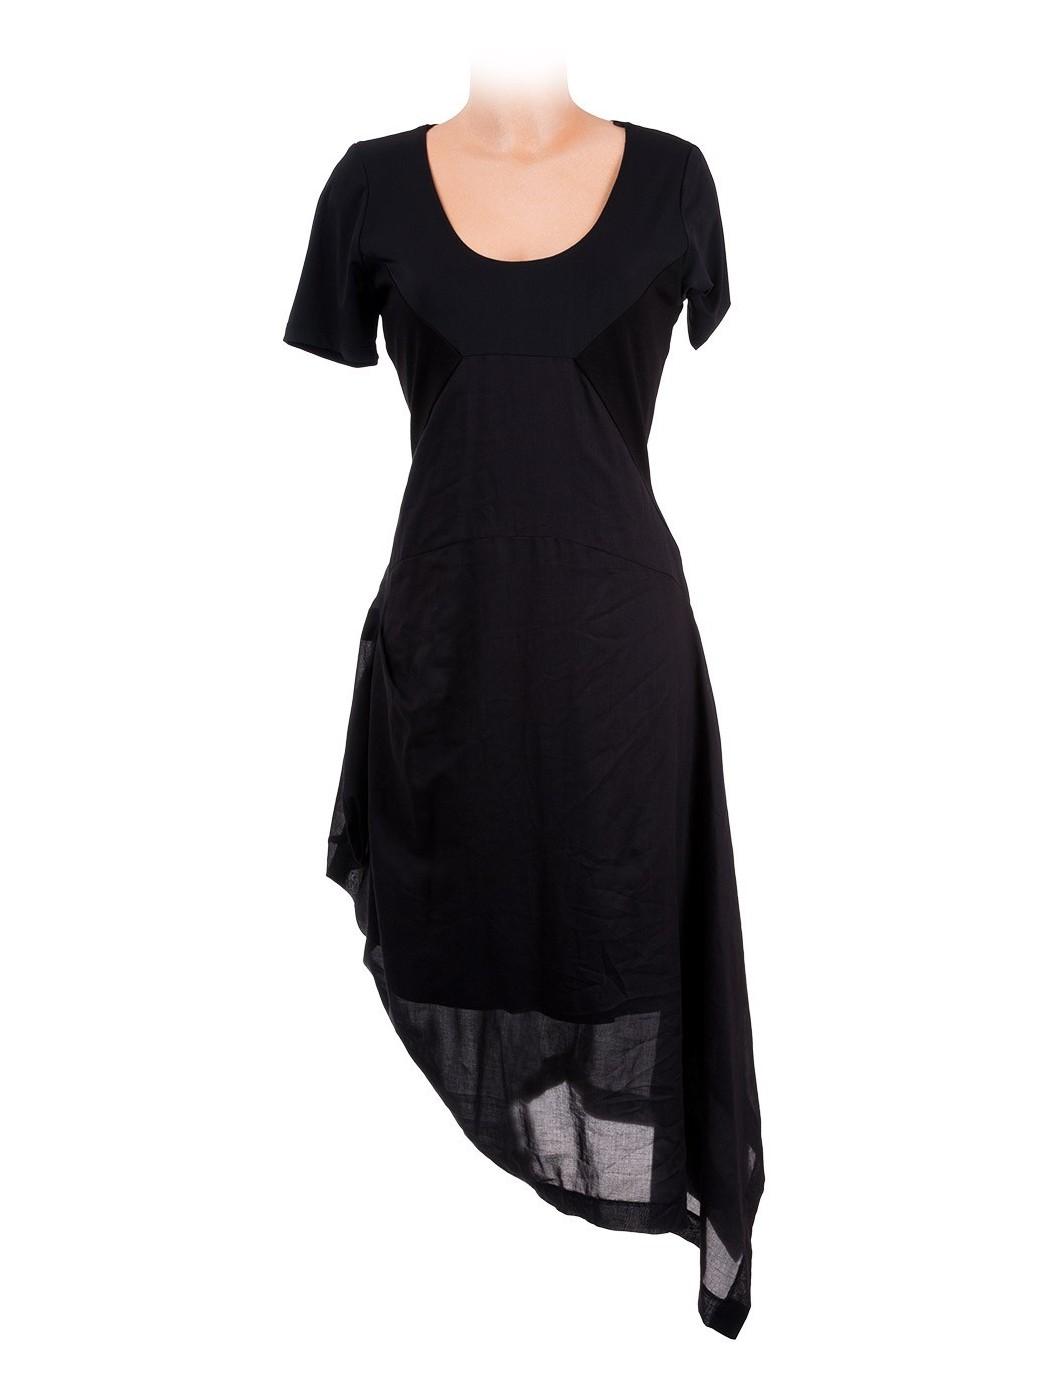 Concept K asymmetric dress